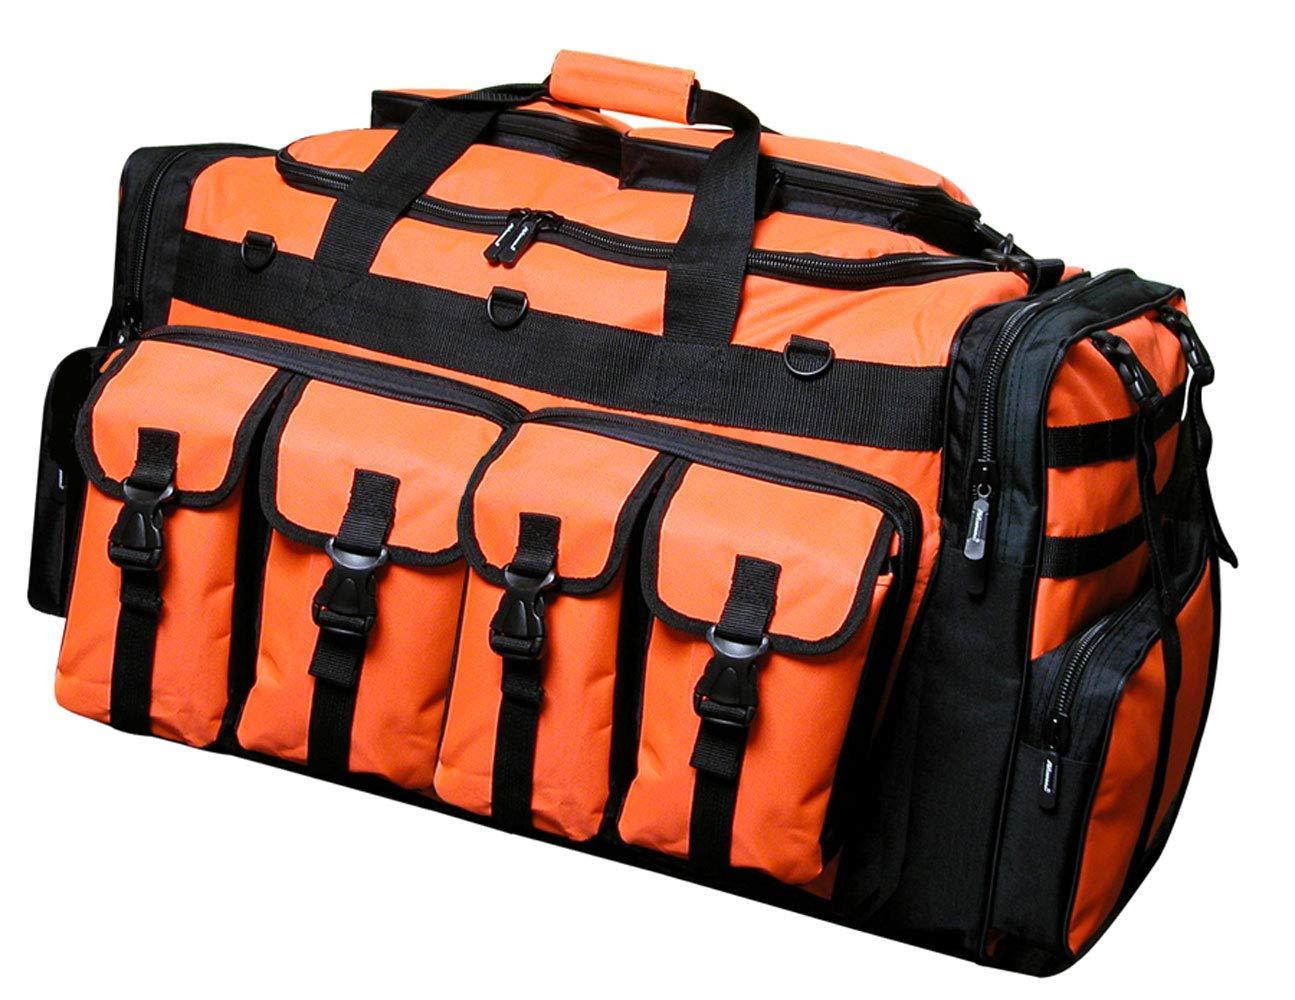 Nexpak 30'' Tactical Duffle Military Molle Gear Shoulder Strap Range Bag TF130 NO Neon Orange by Nexpak